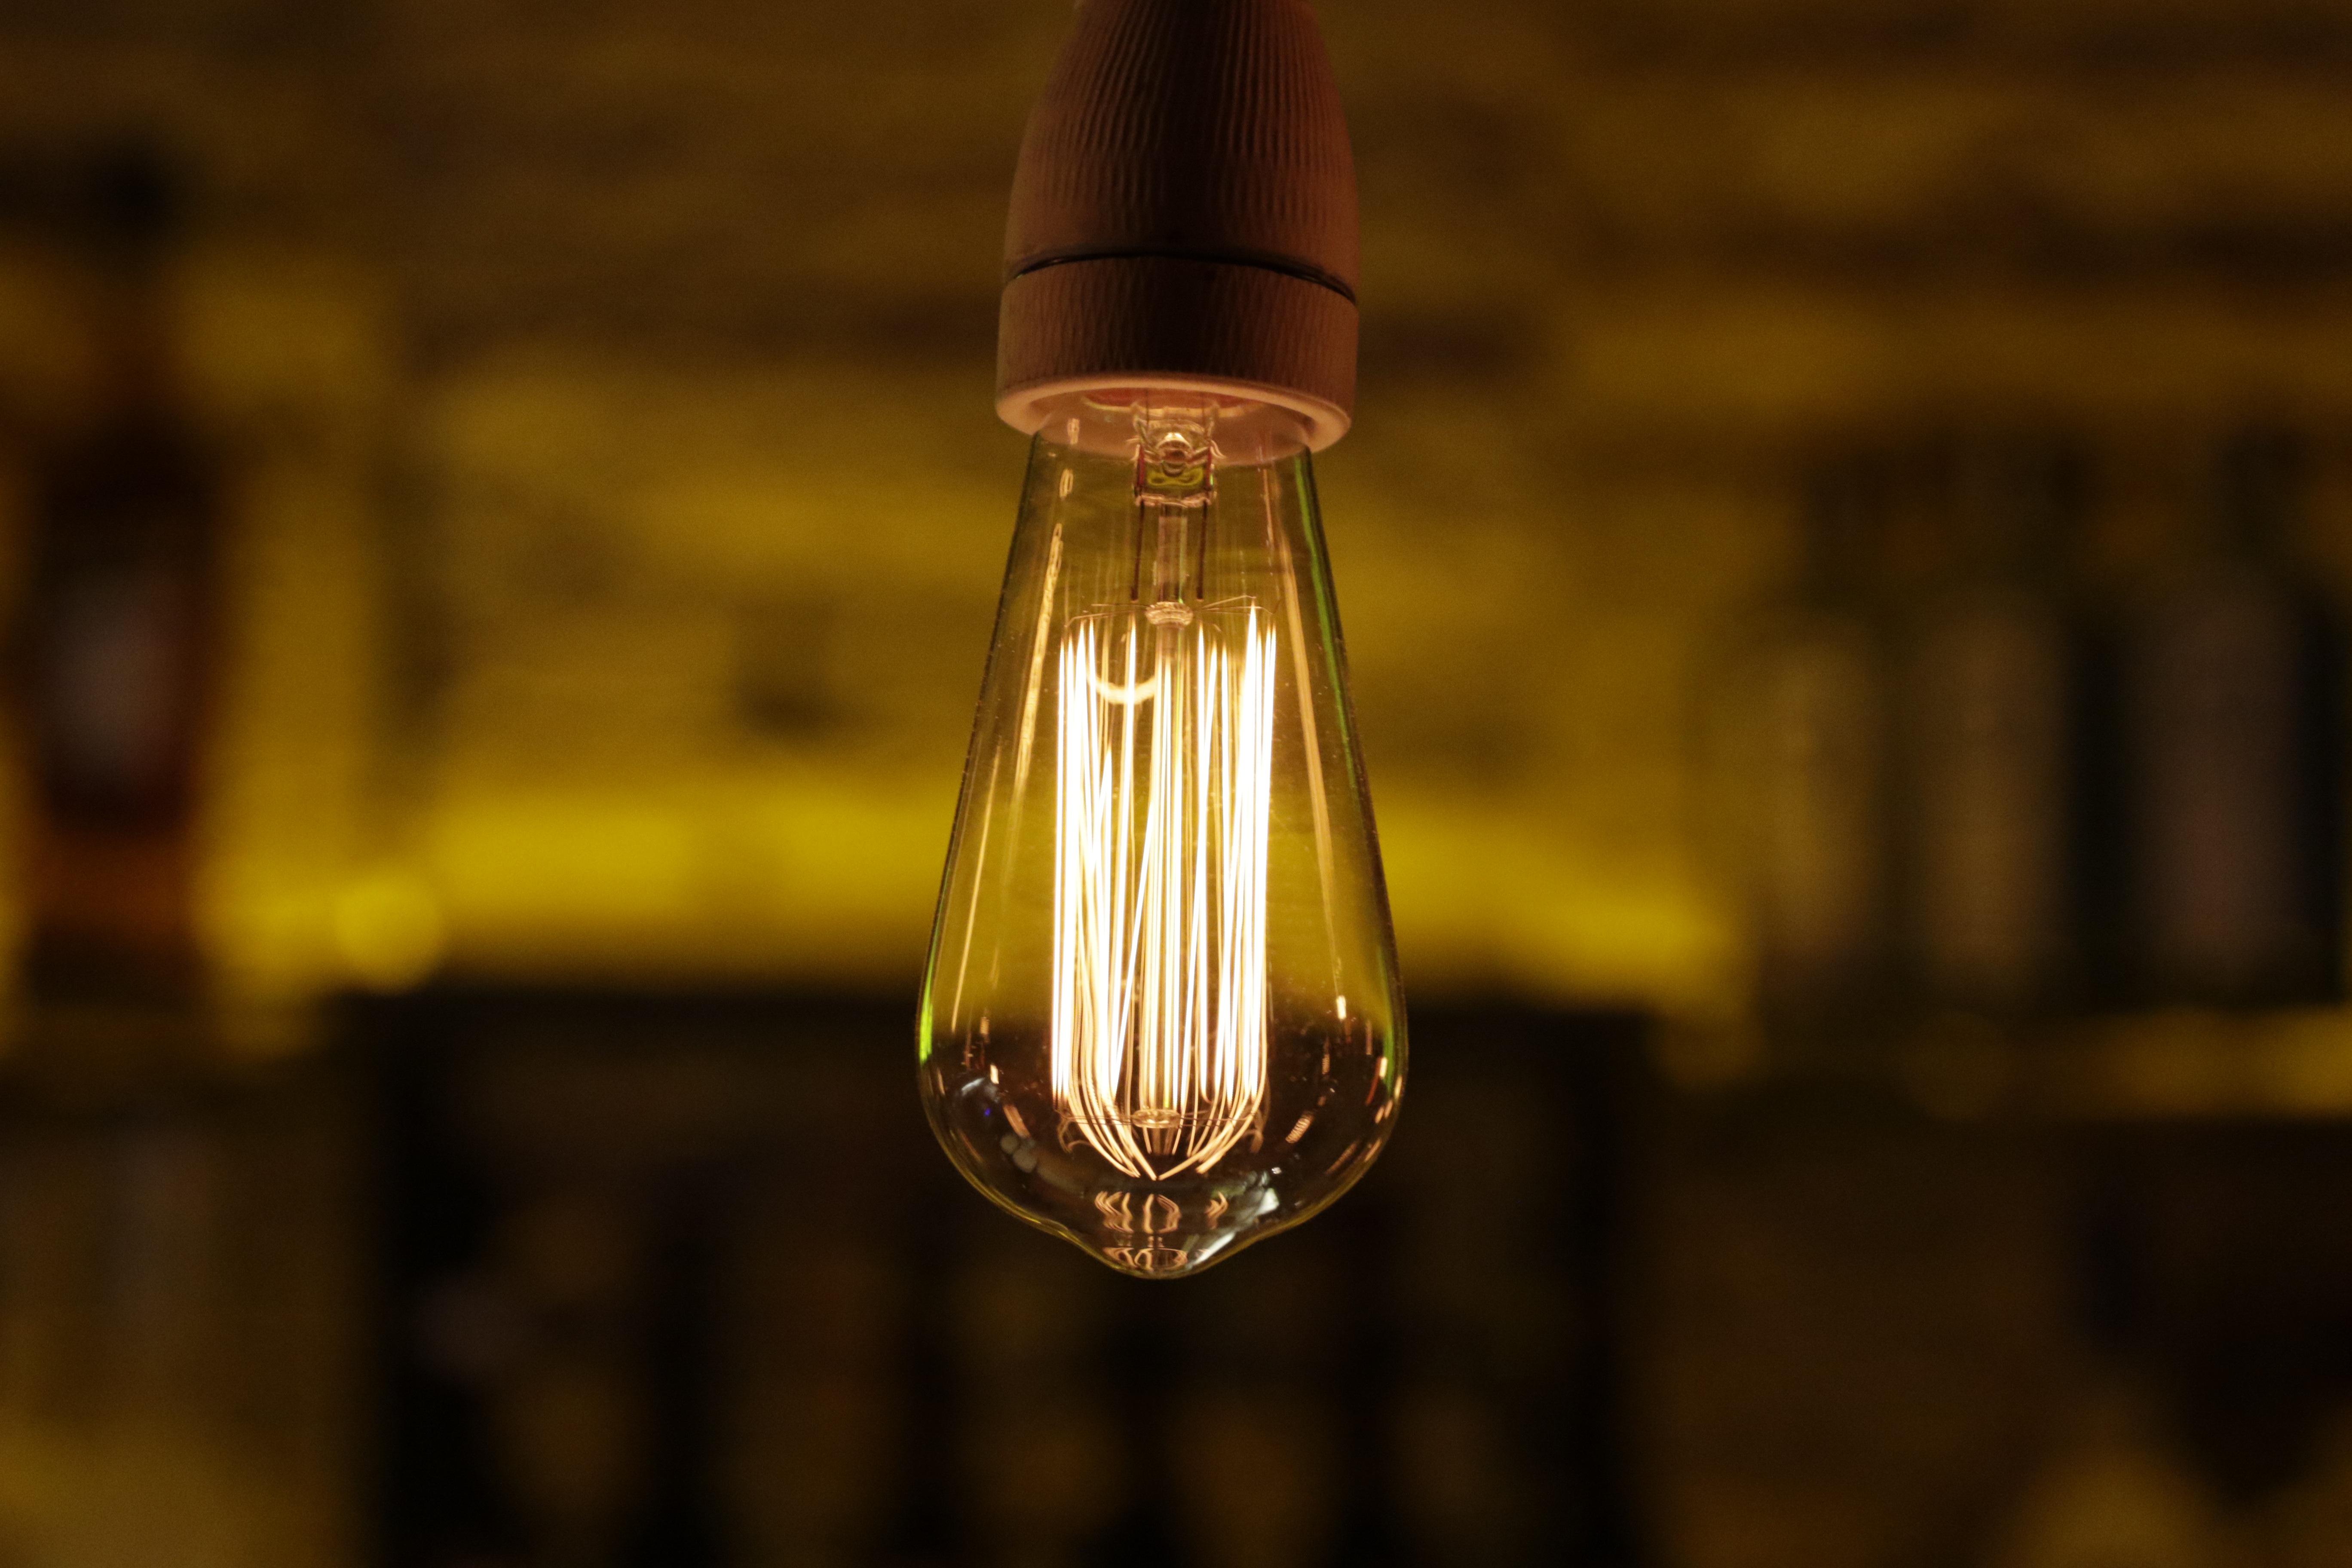 Free Images Wine Old Bar Lamp Light Bulb Lighting